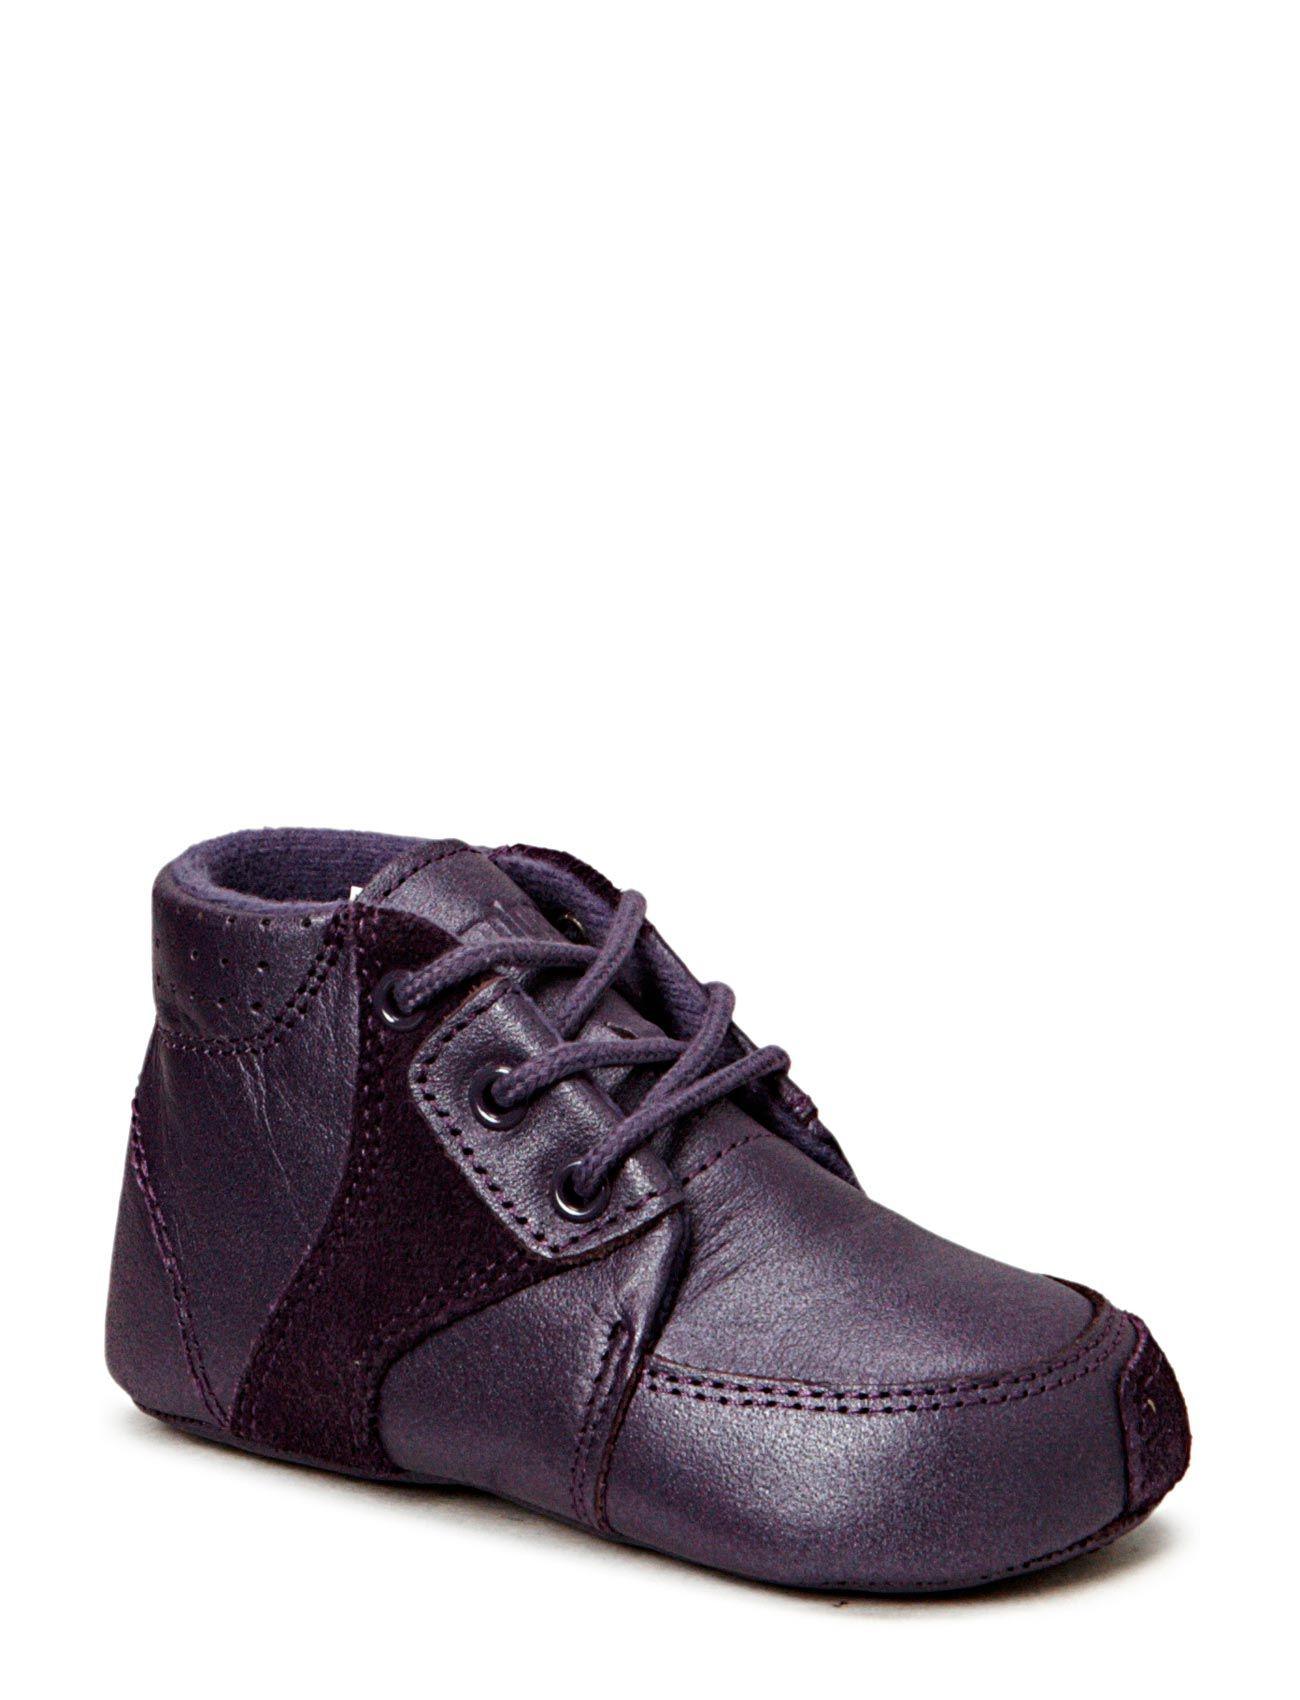 bundgaard Prewalker purple w/laces på boozt.com dk